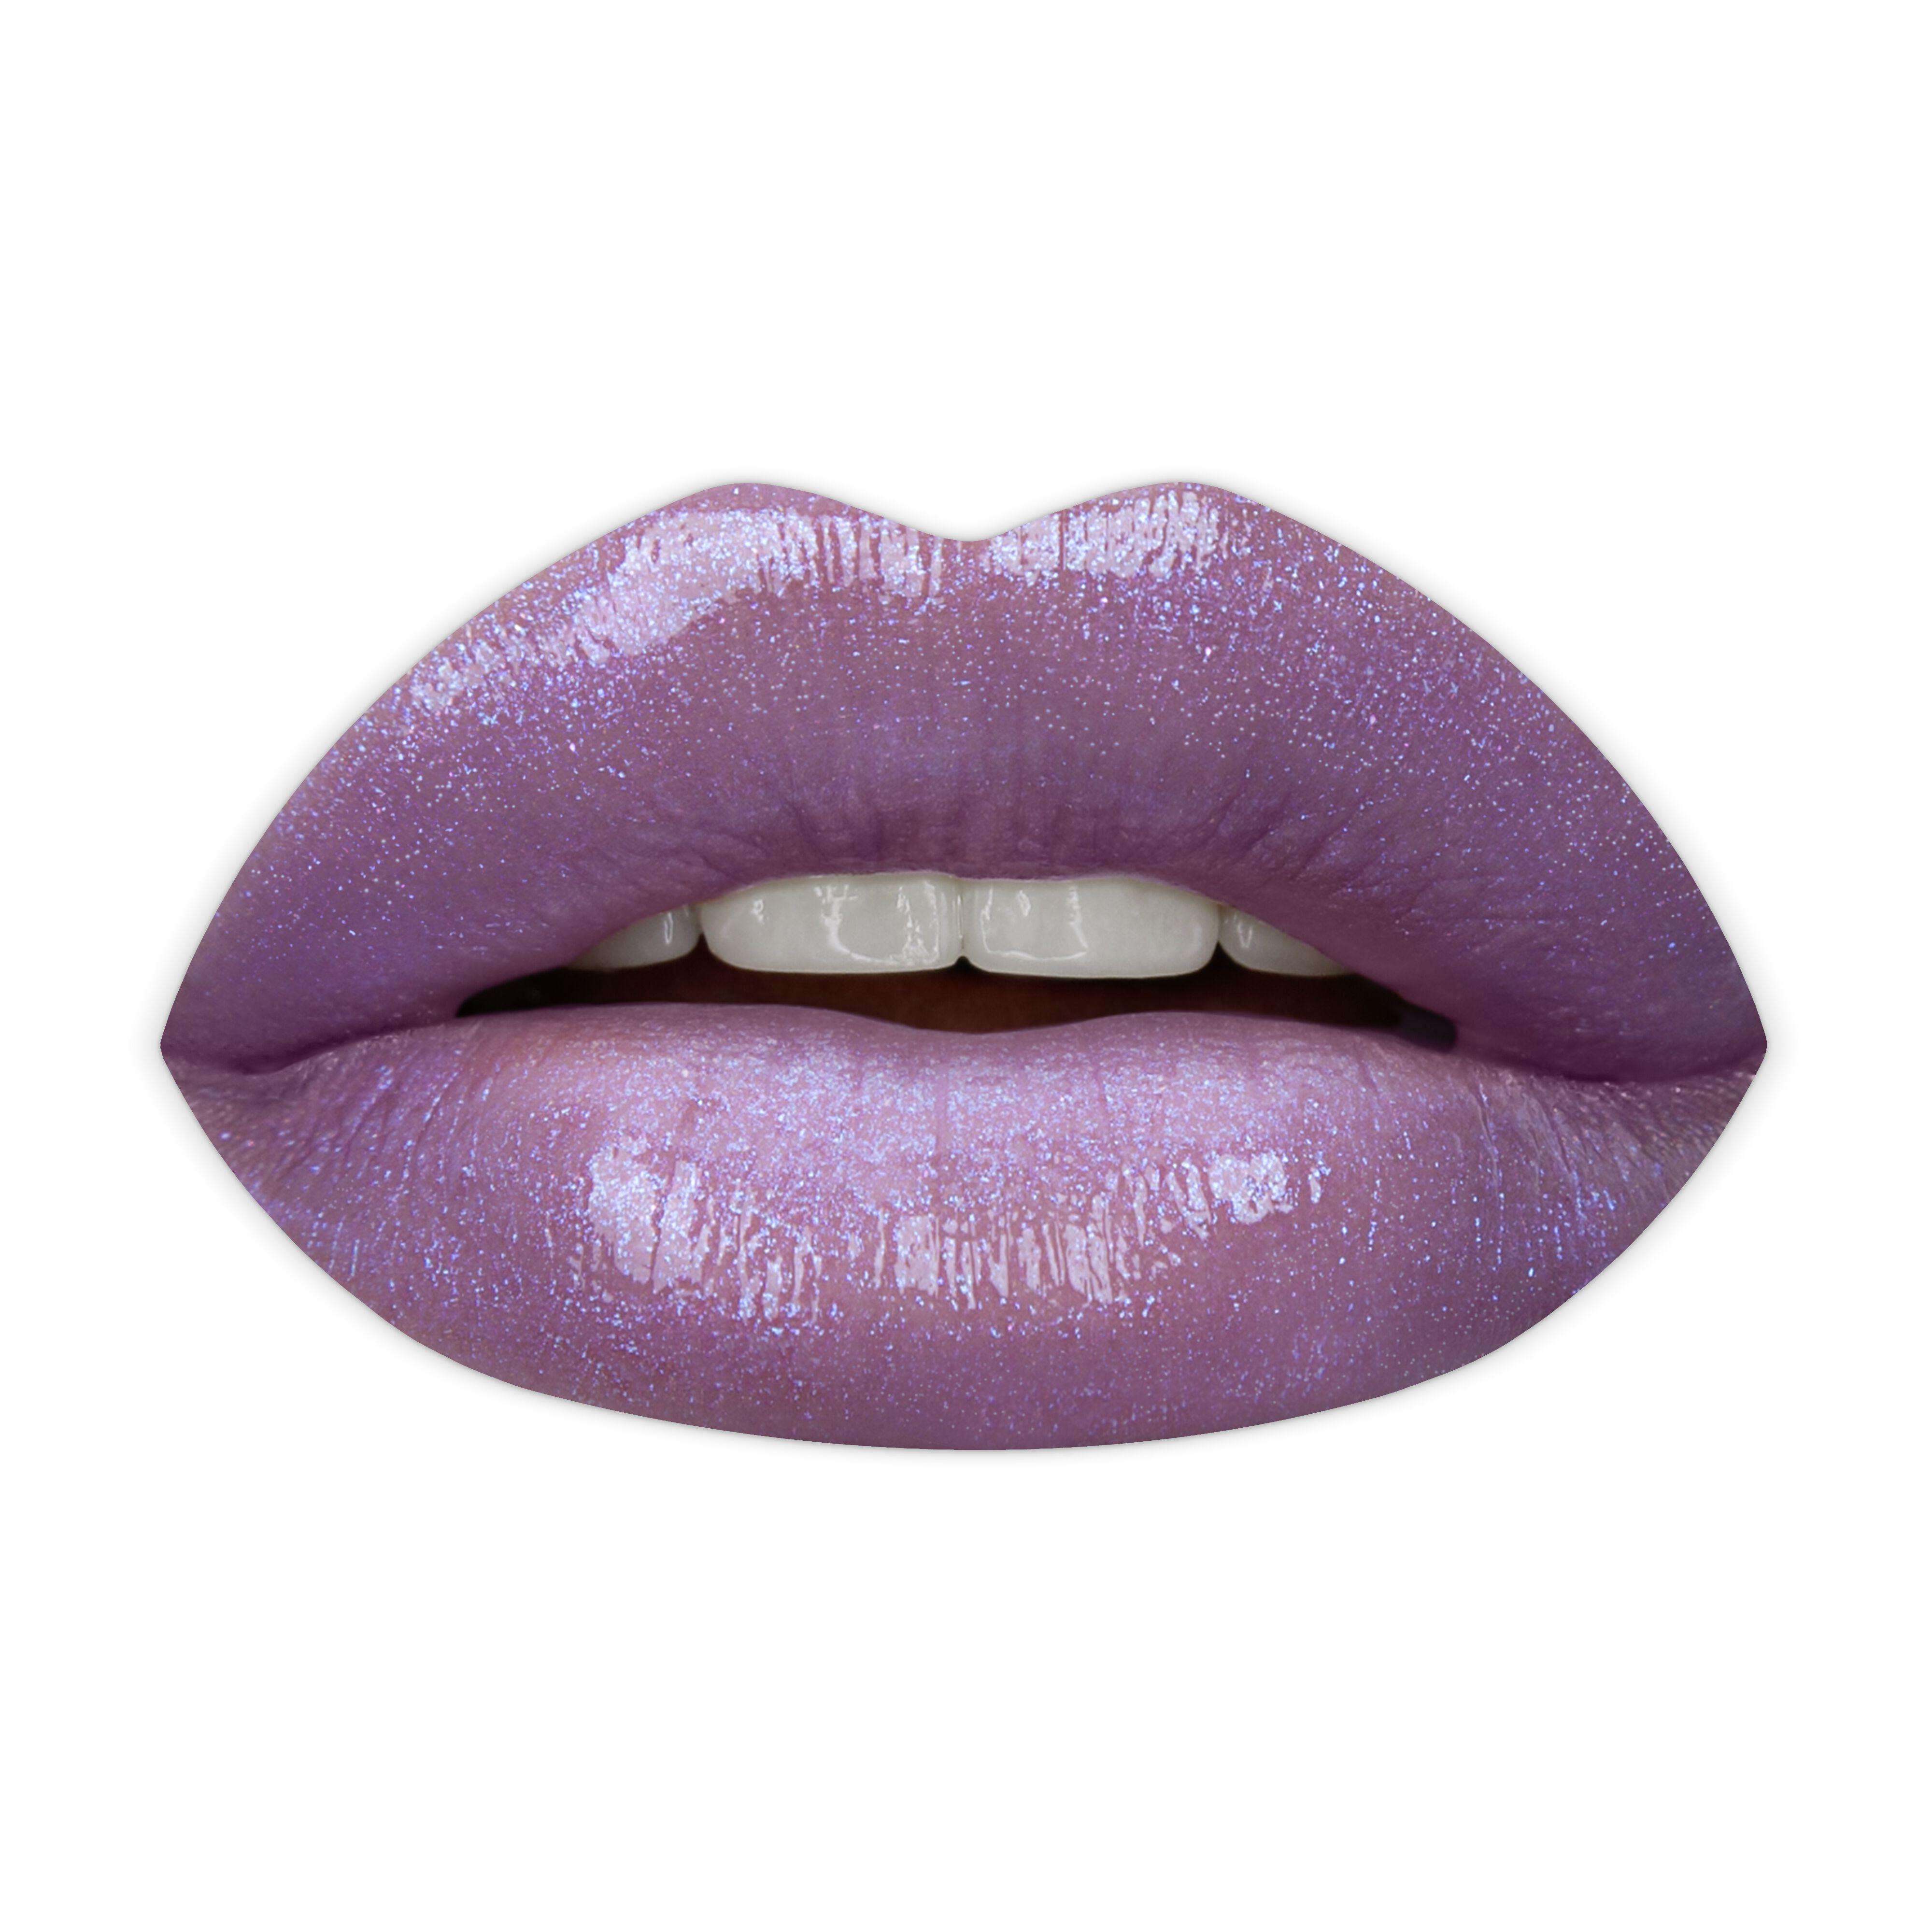 Huda Beauty Lip Strobe Lipstick in Mystical - Shop Now